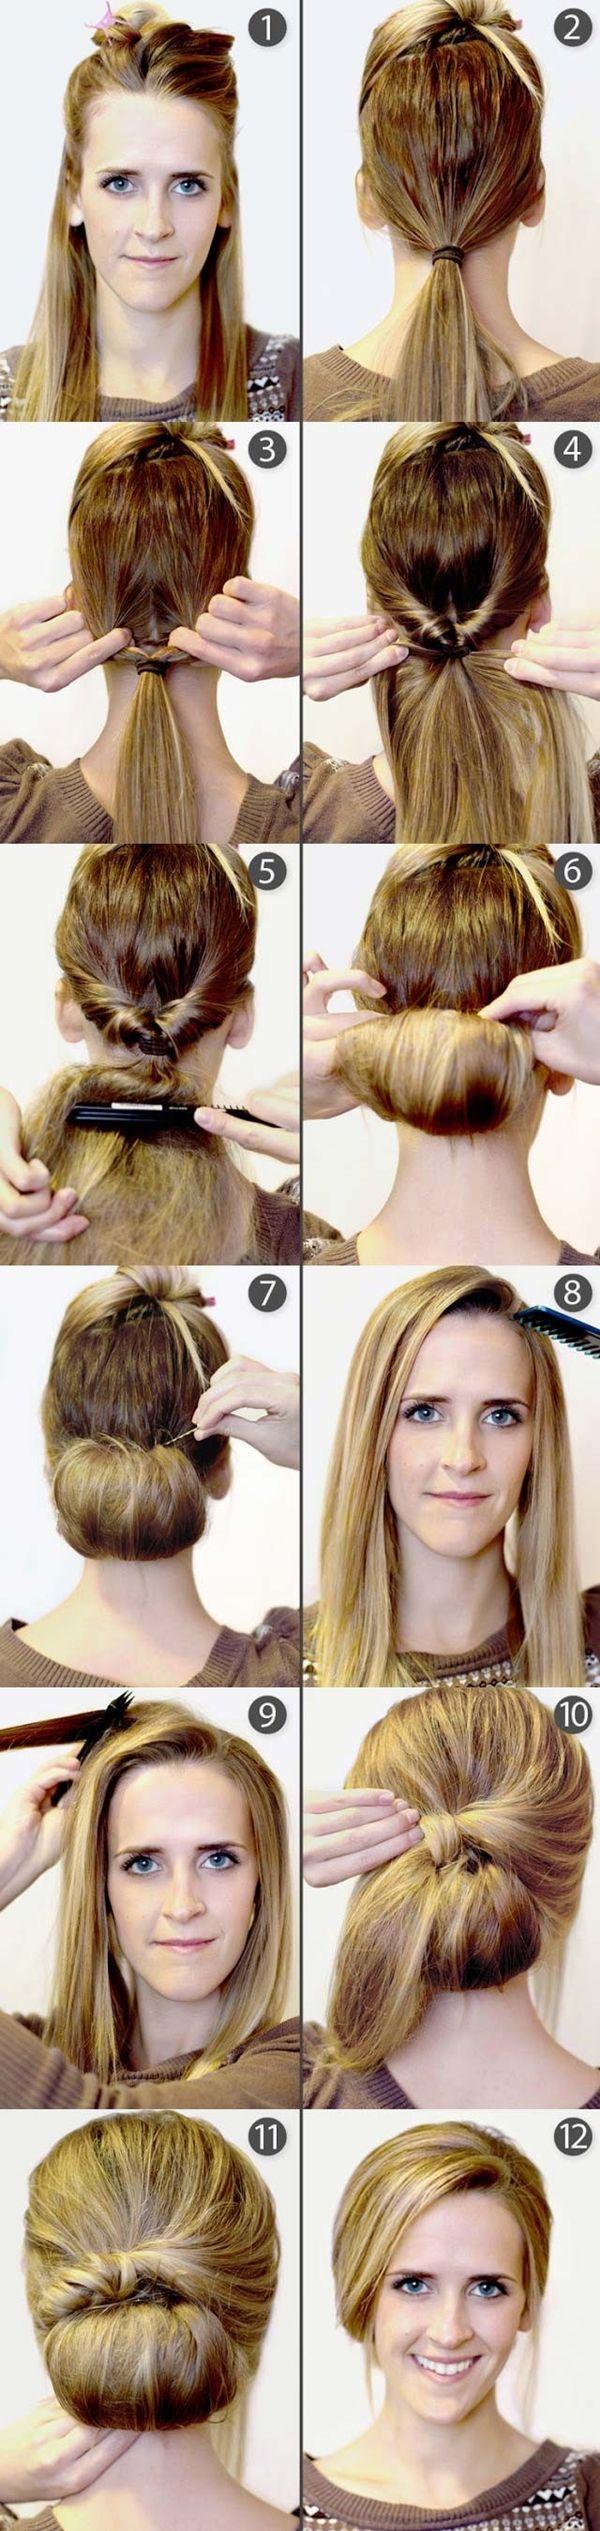 best 102 fifties hair and makeup ideas on pinterest   hair dos